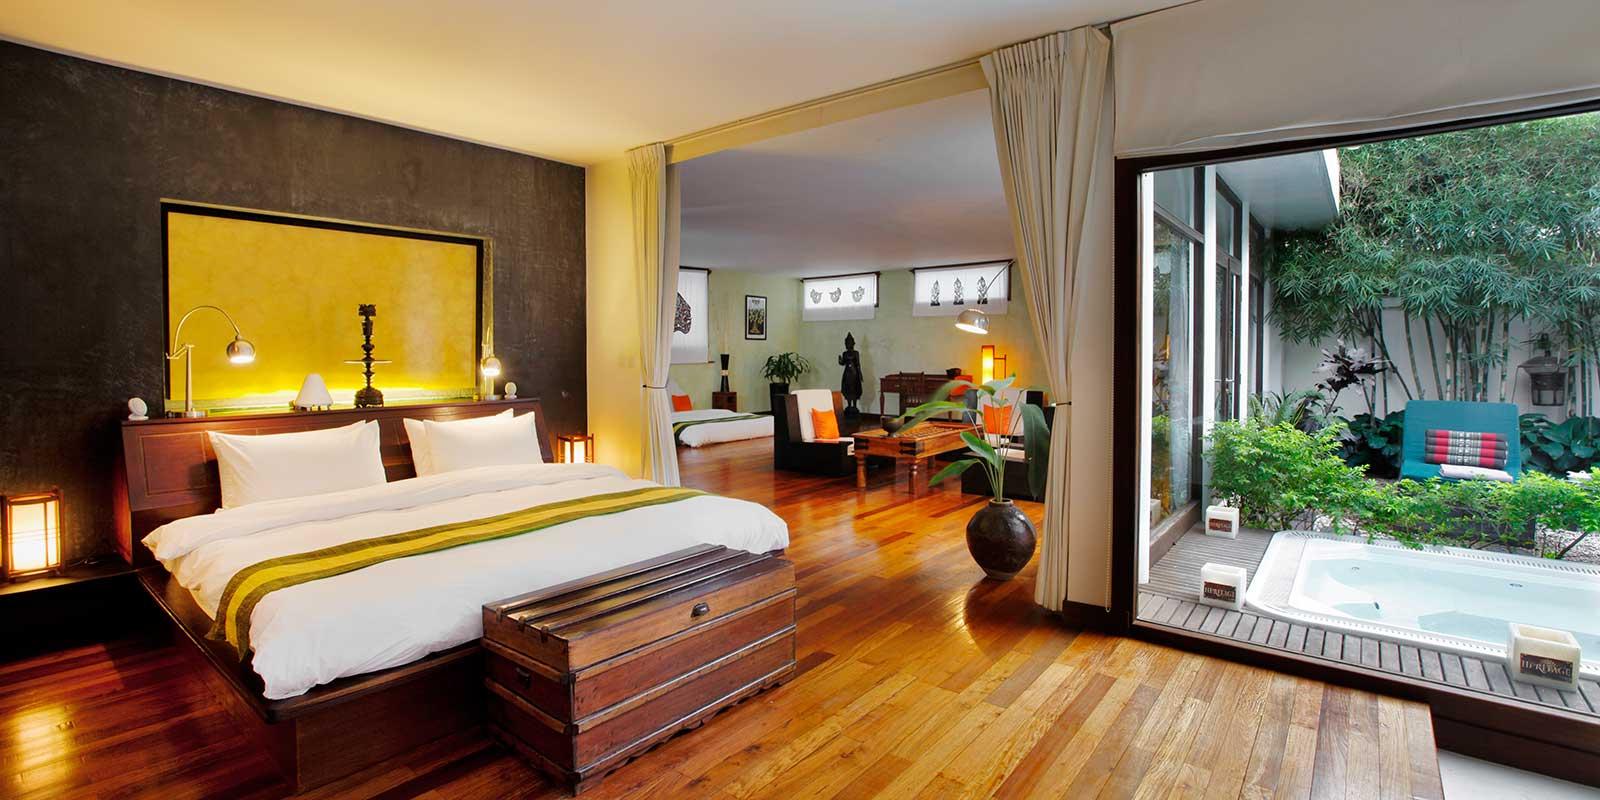 Heritage-Suites-Hotel_1600x800